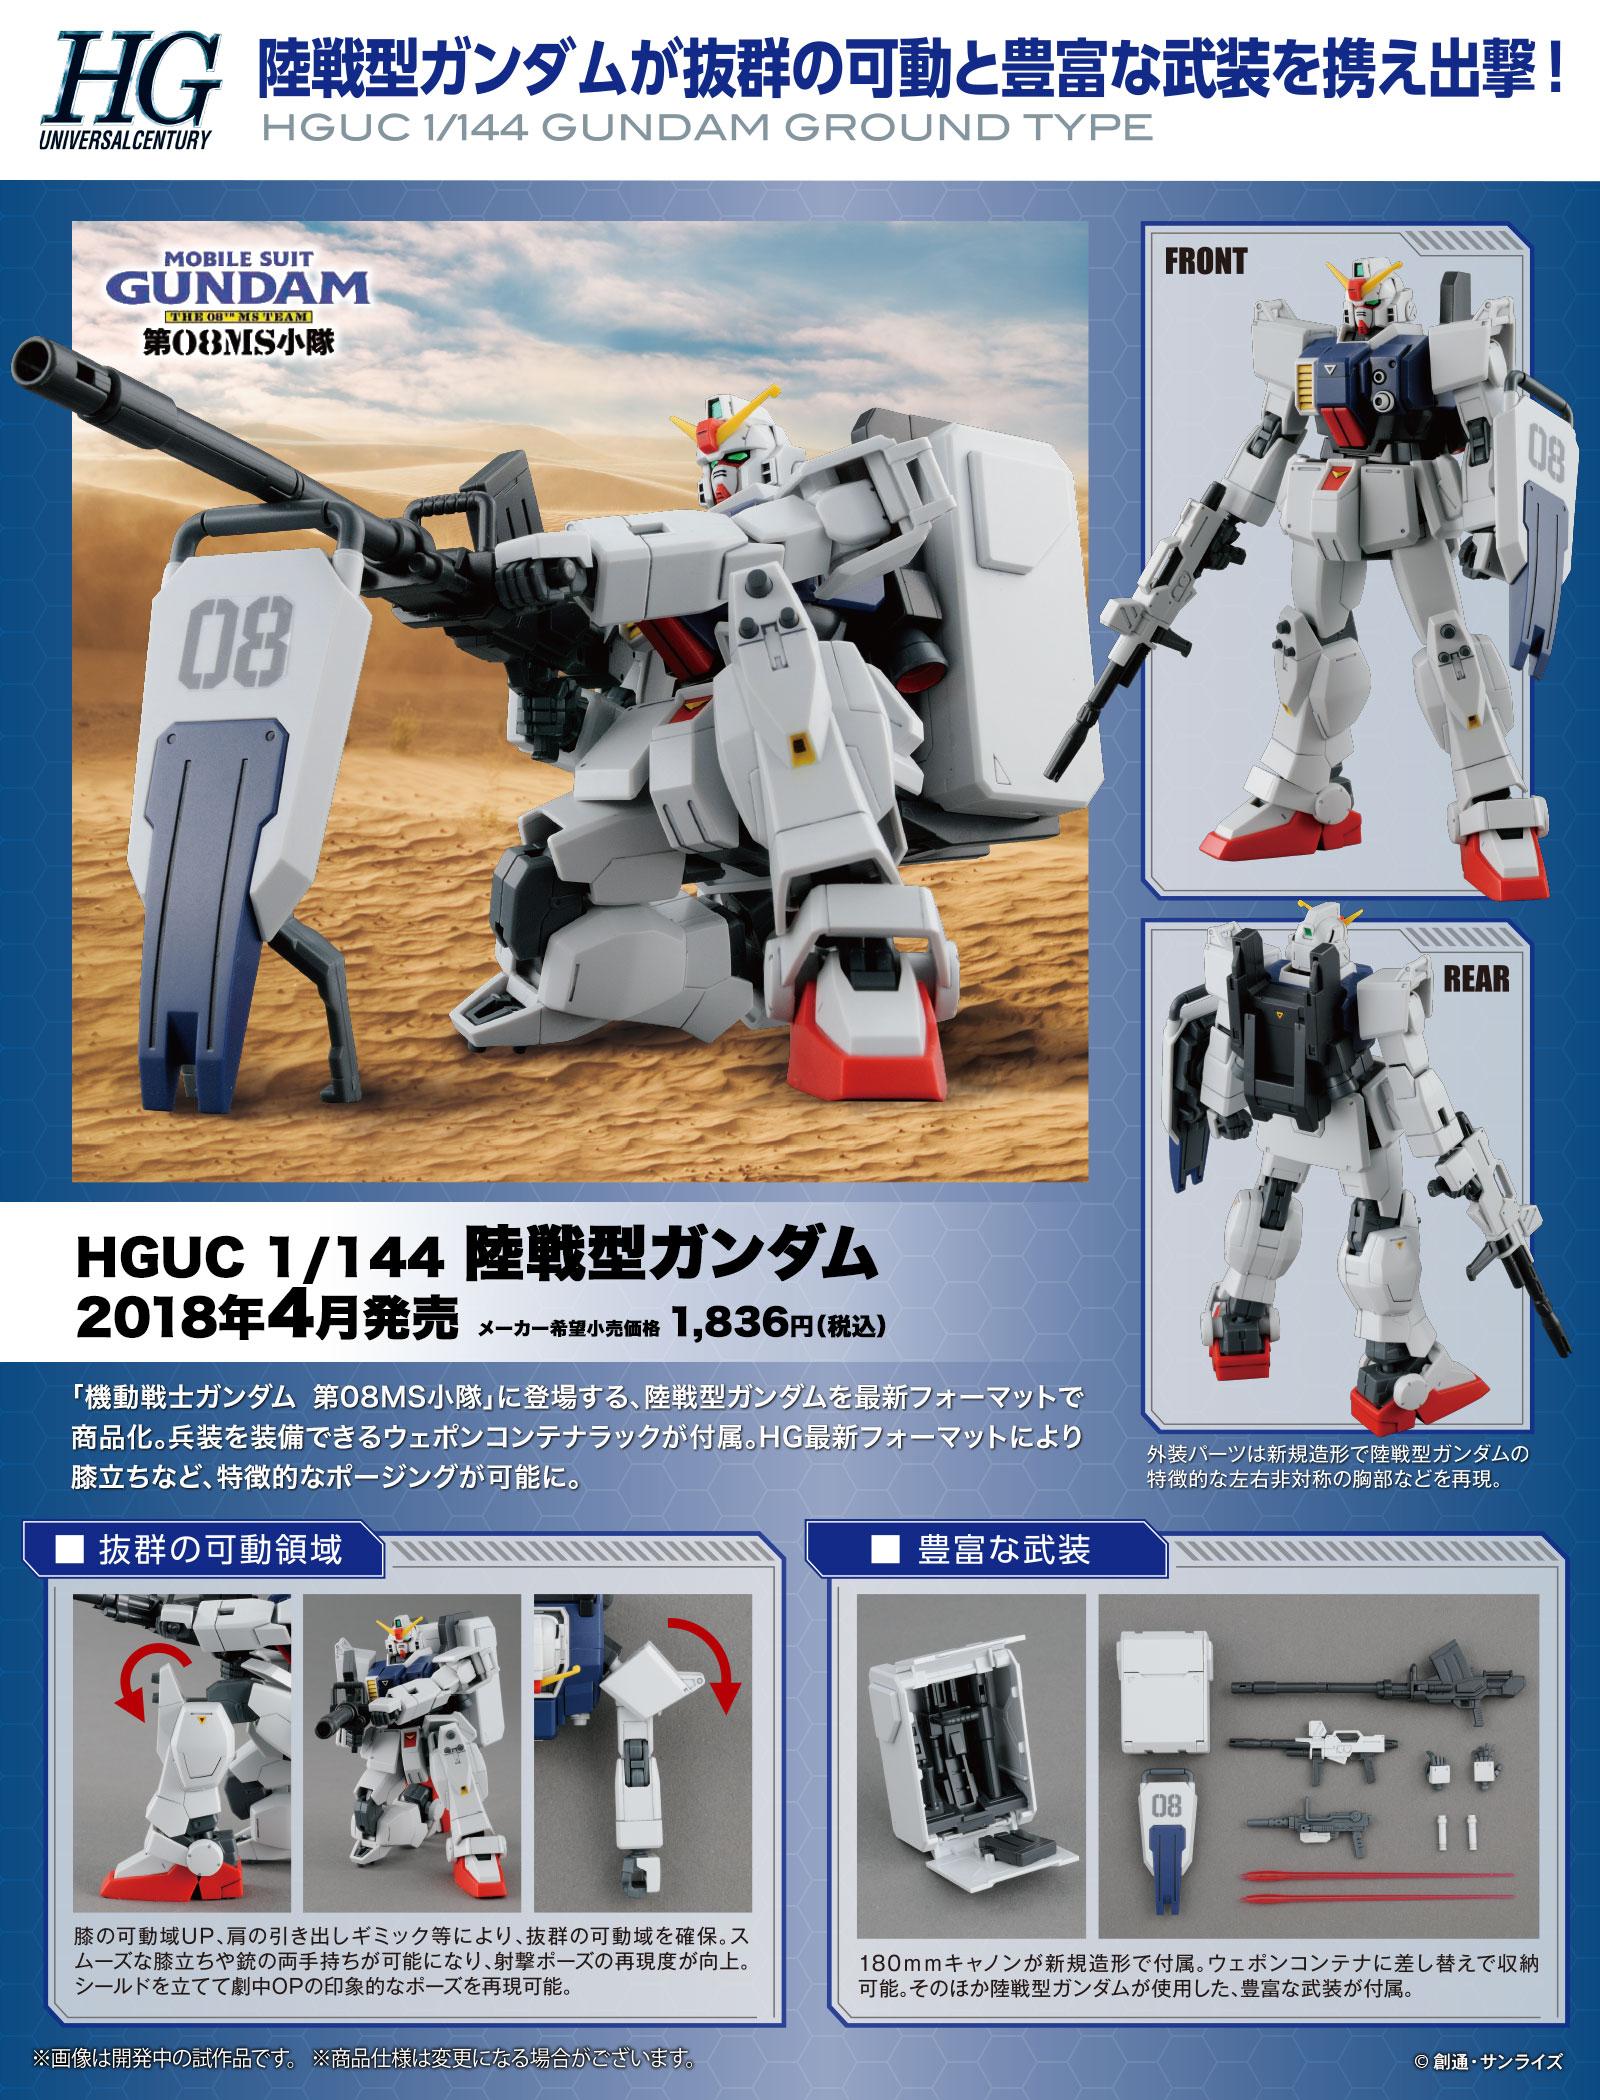 HGUC 1/144 陸戦型ガンダム 公式商品説明(画像)